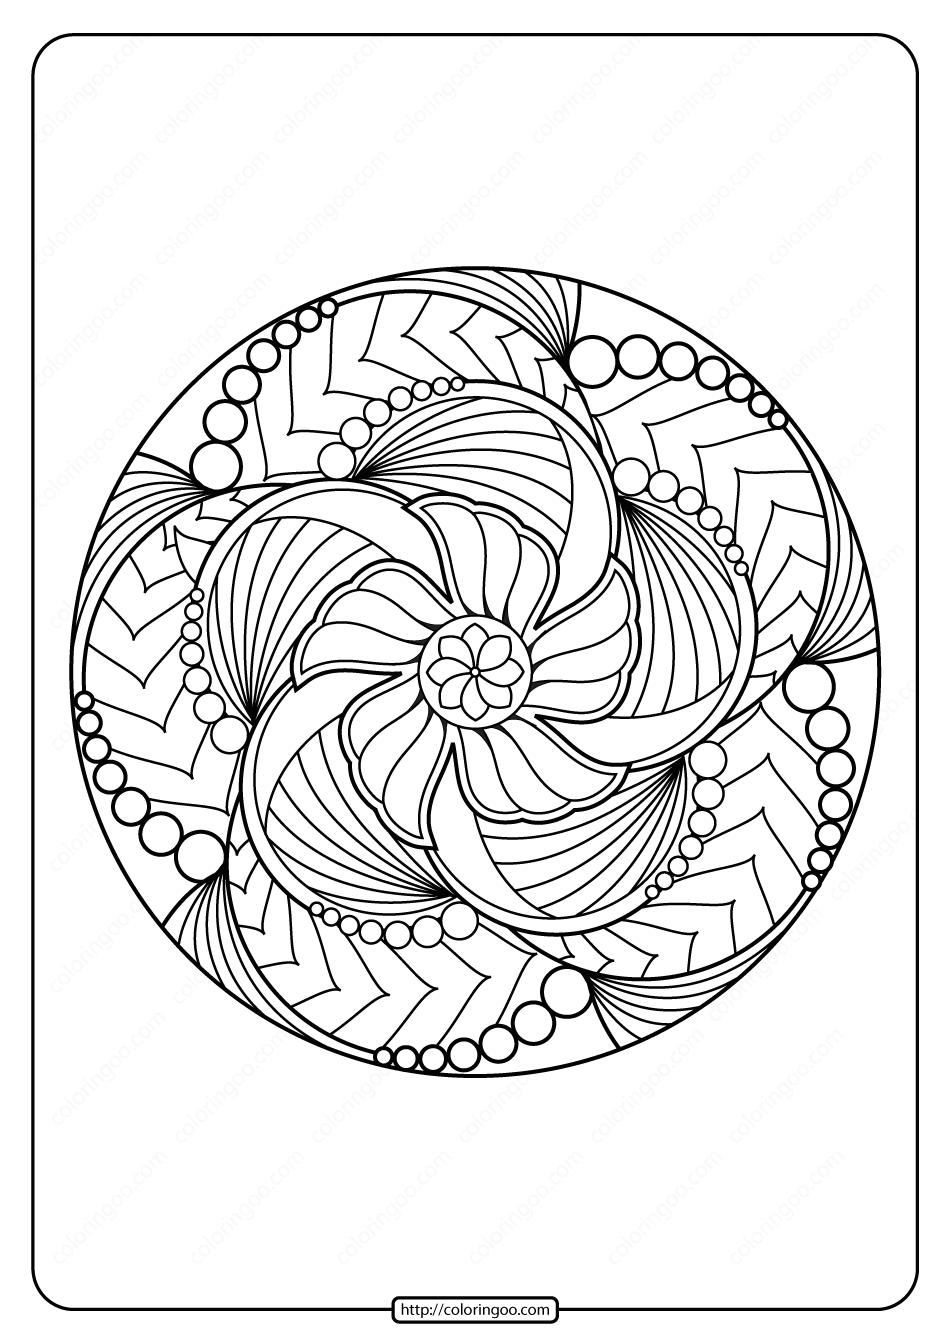 Free Printable Adult Floral Mandala Coloring Page 70